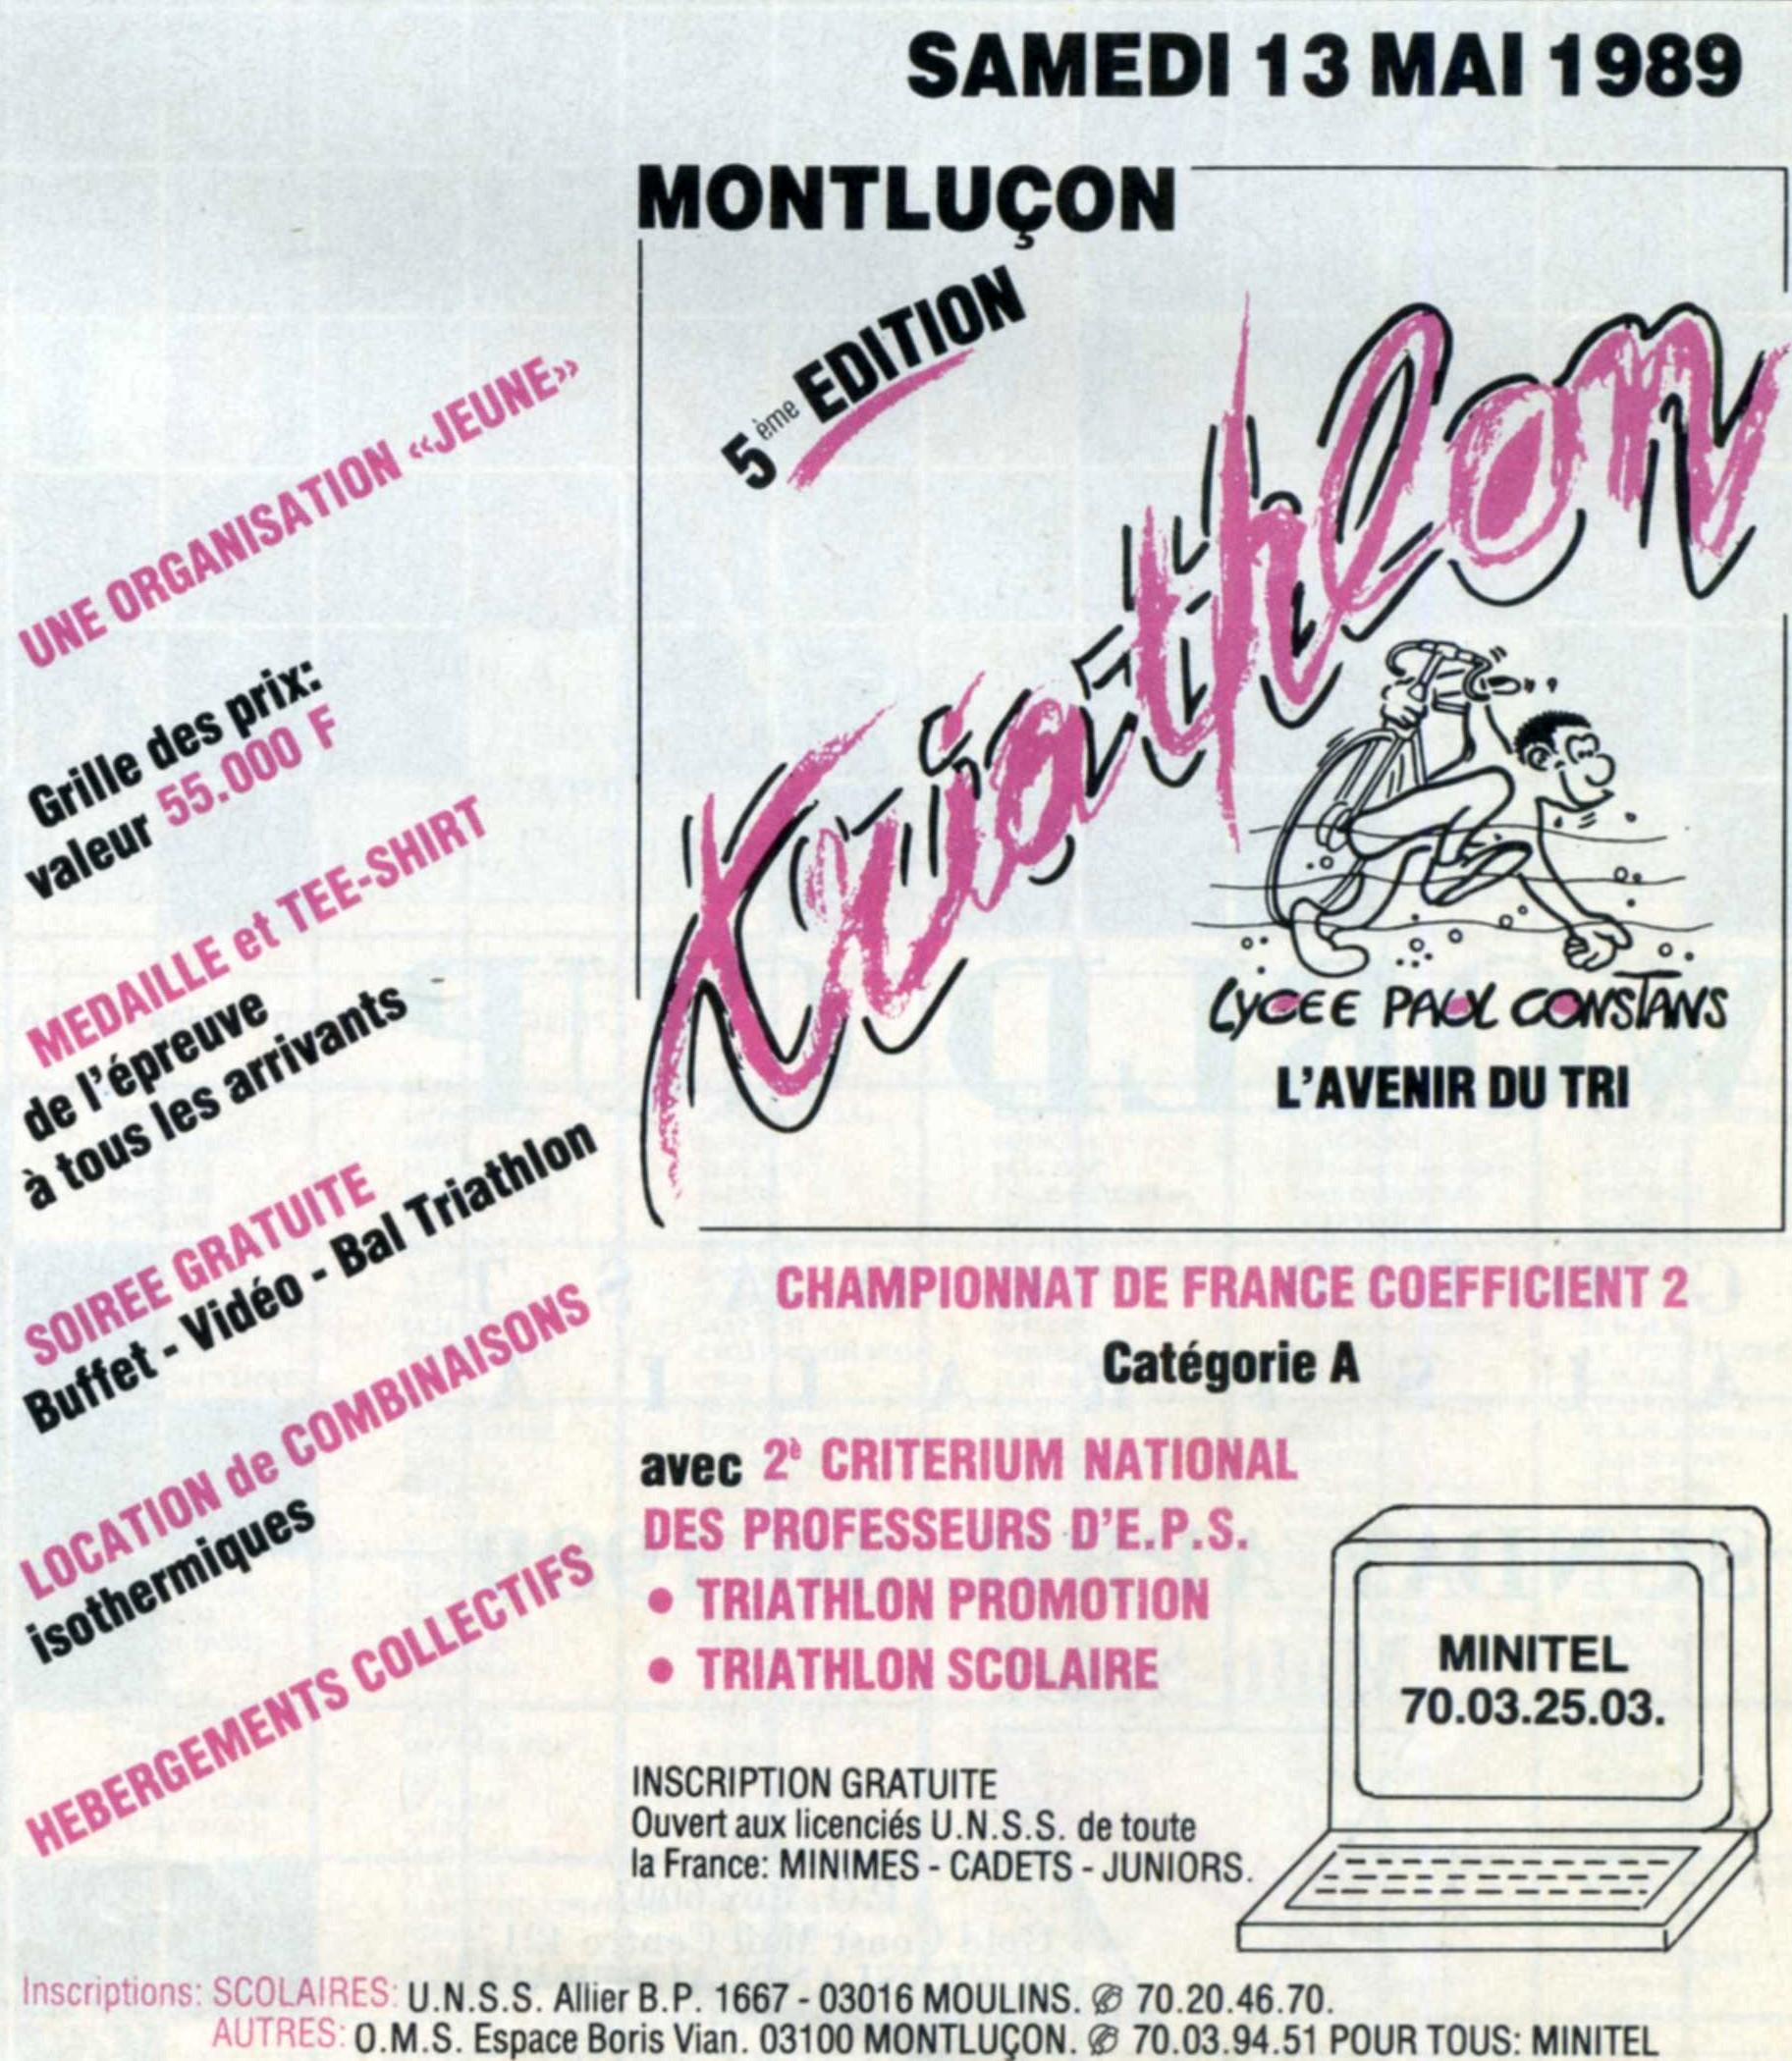 img[A]015_13-mai-1989_MONTLUCON_pub